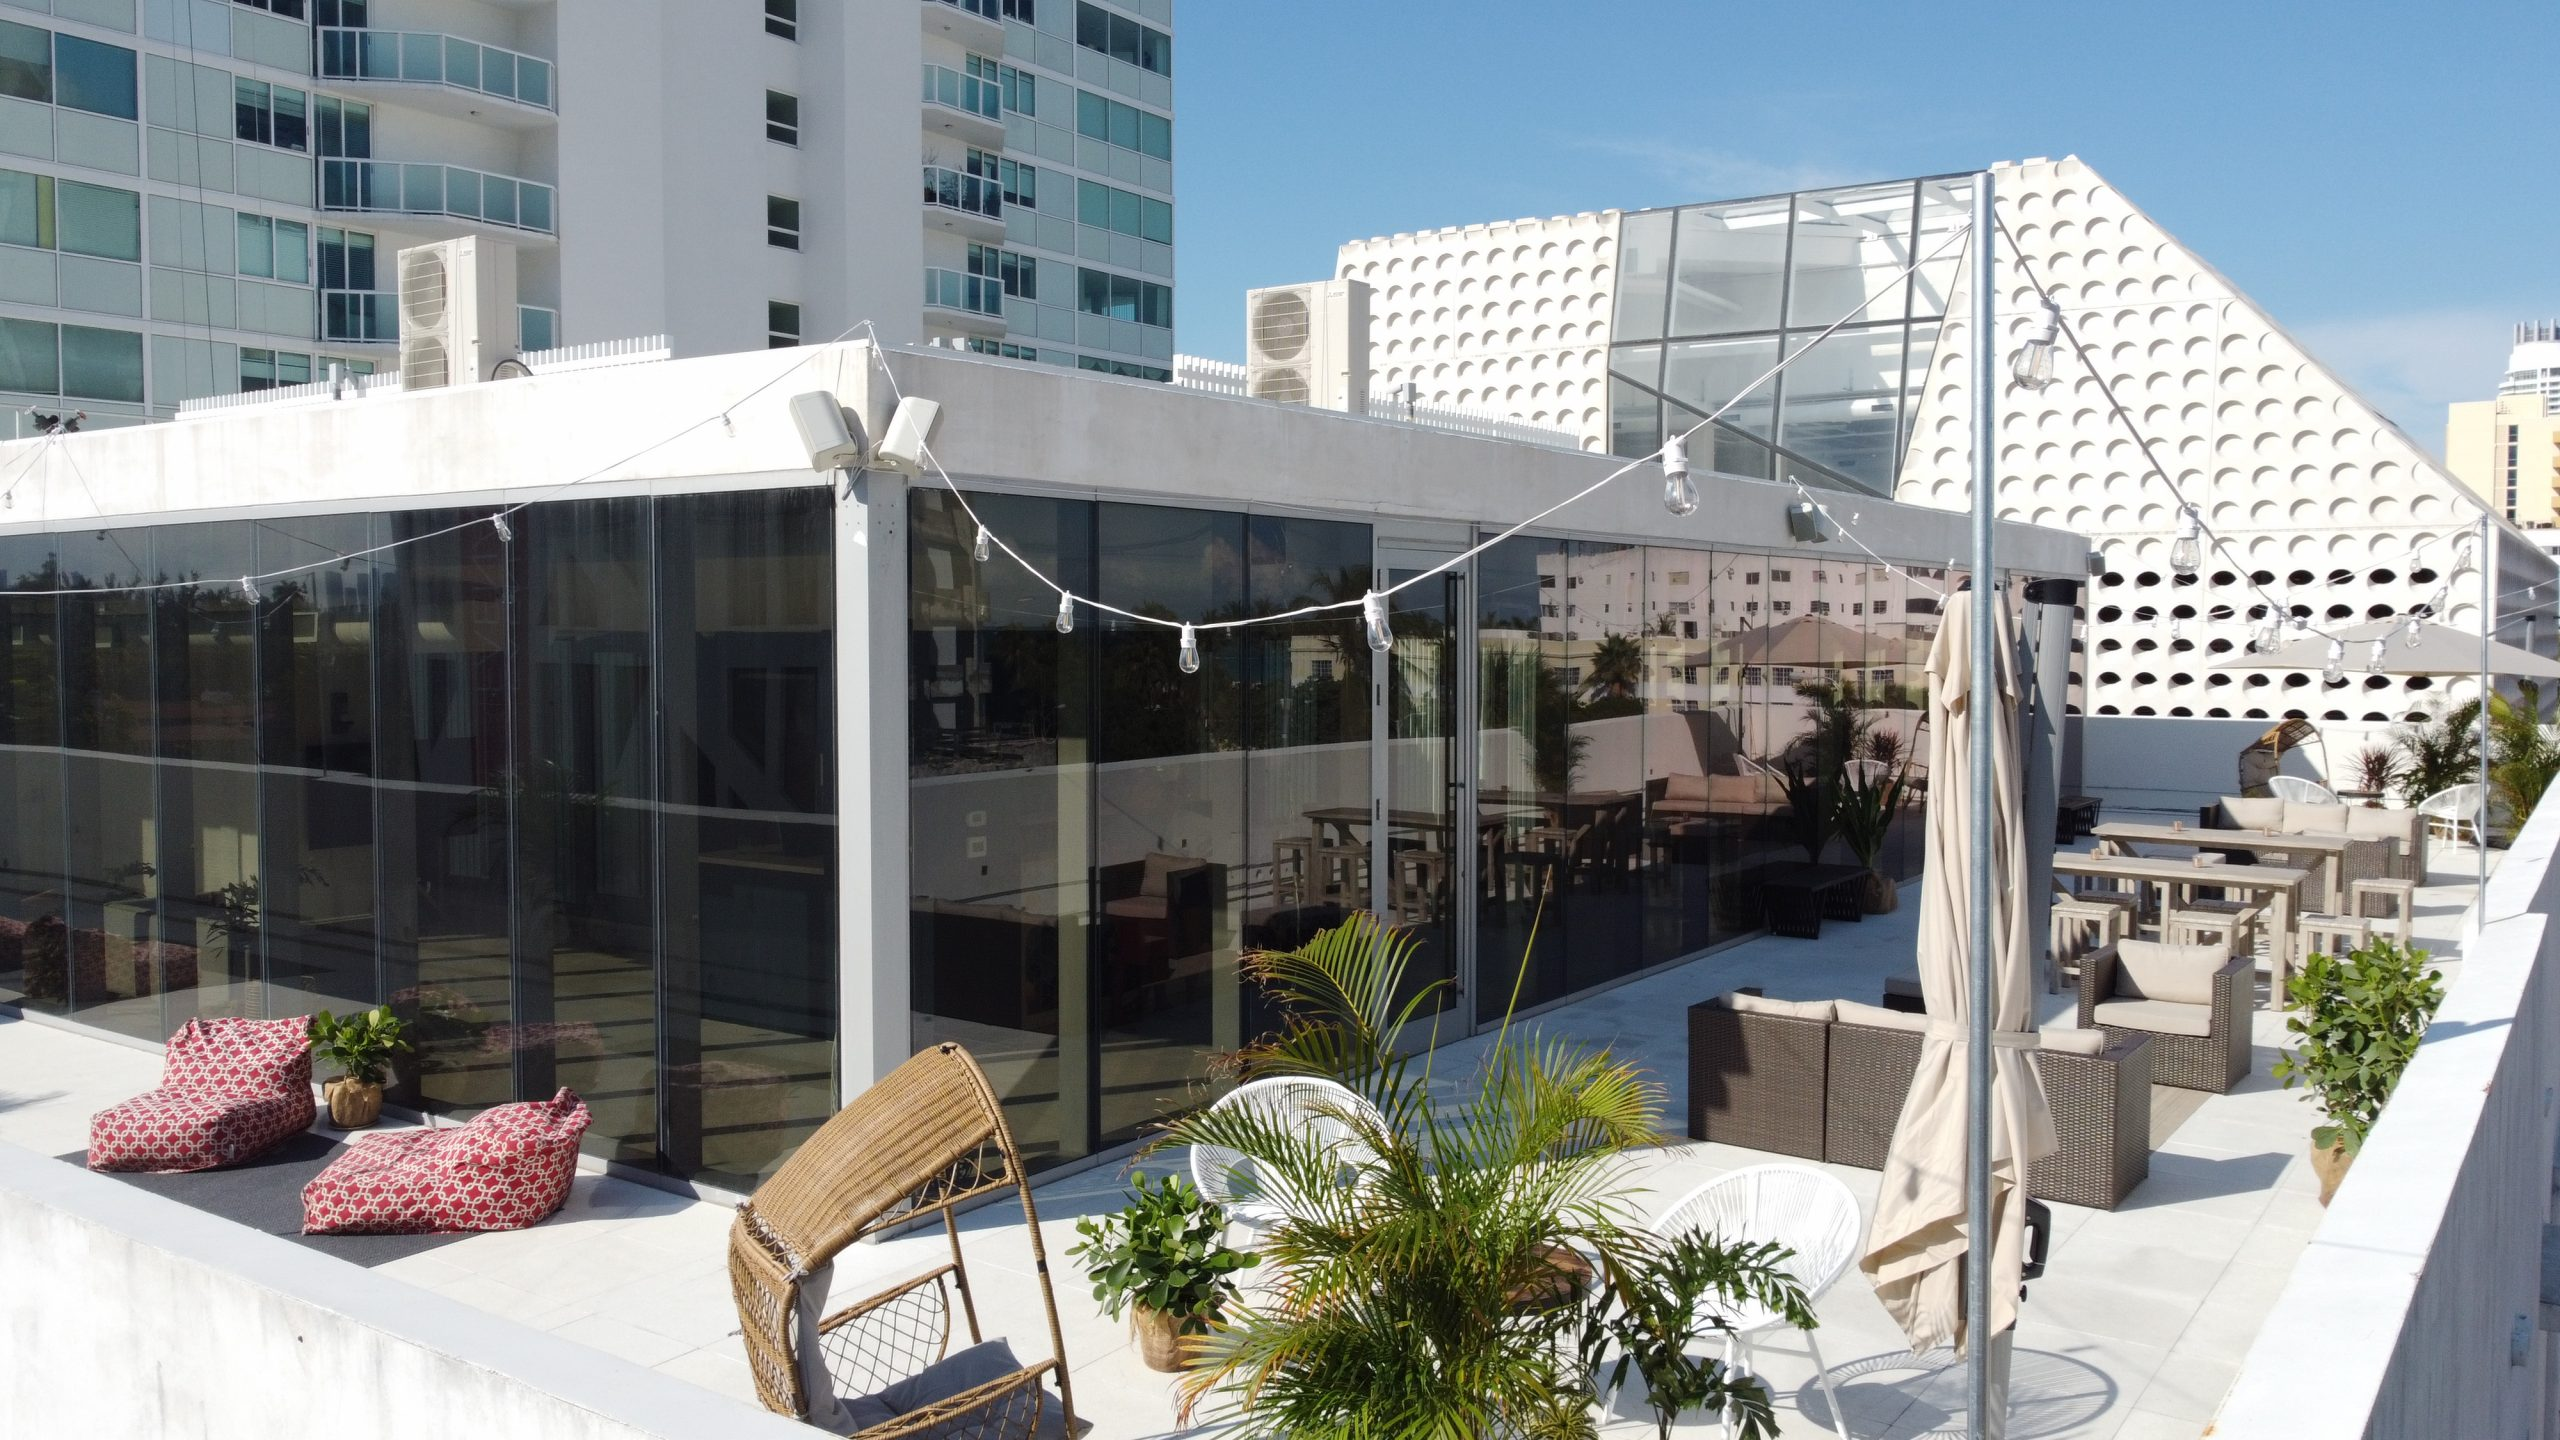 CSTM HAUS Miami Memberships